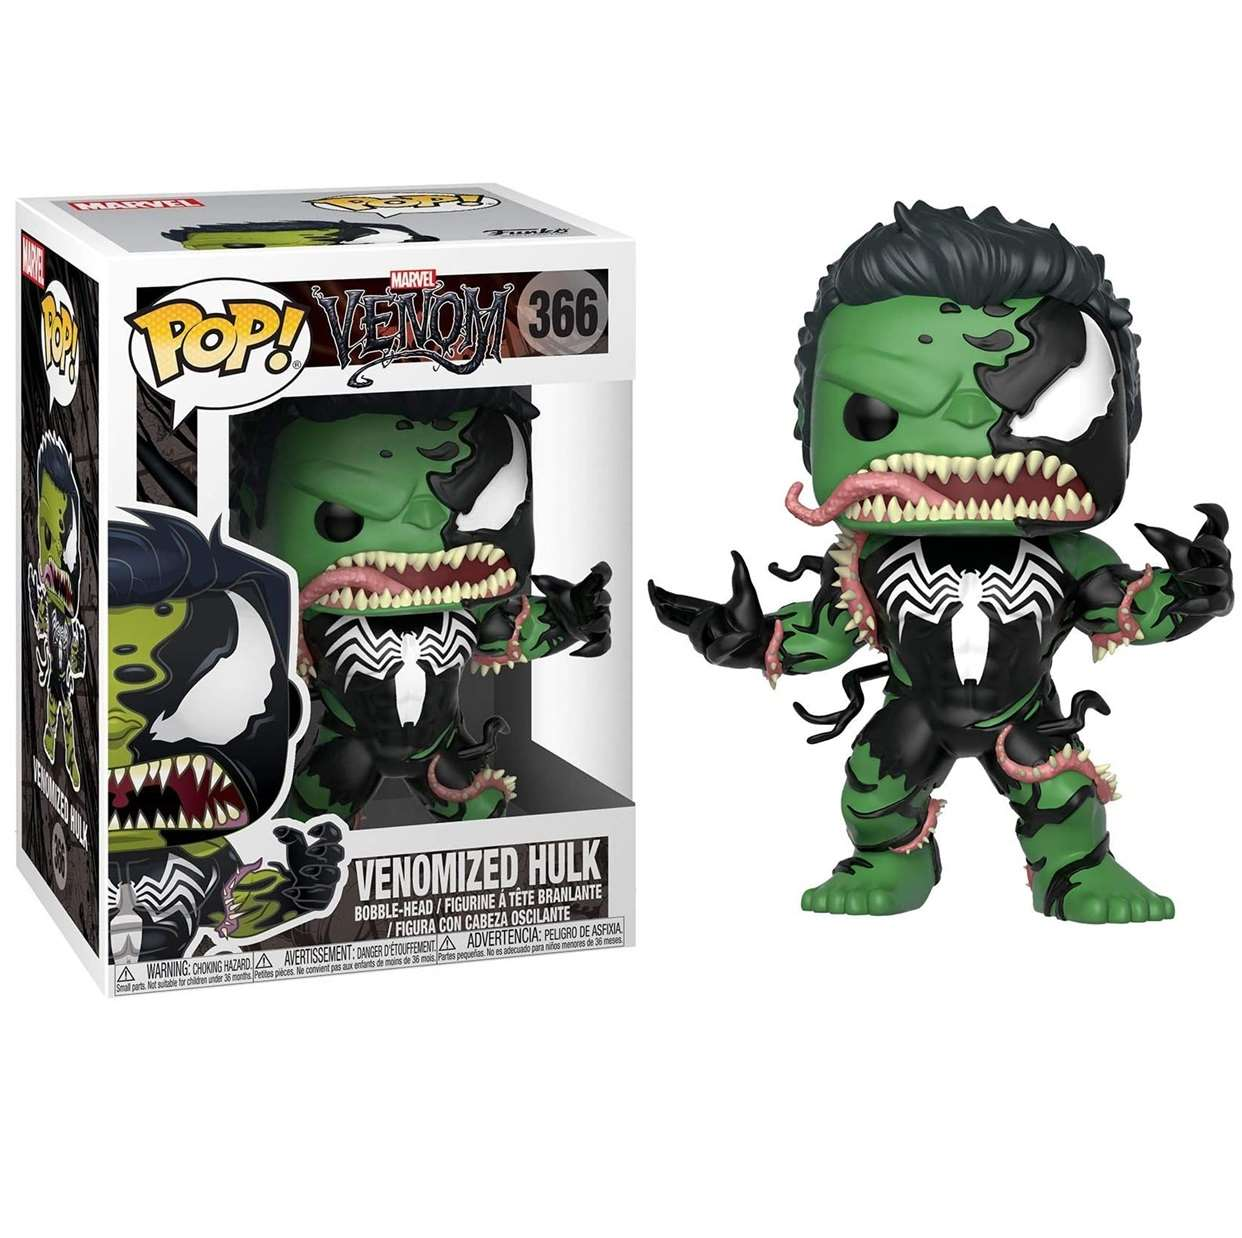 Venomized Hulk #366 Figura Marvel Venom Funko Pop!